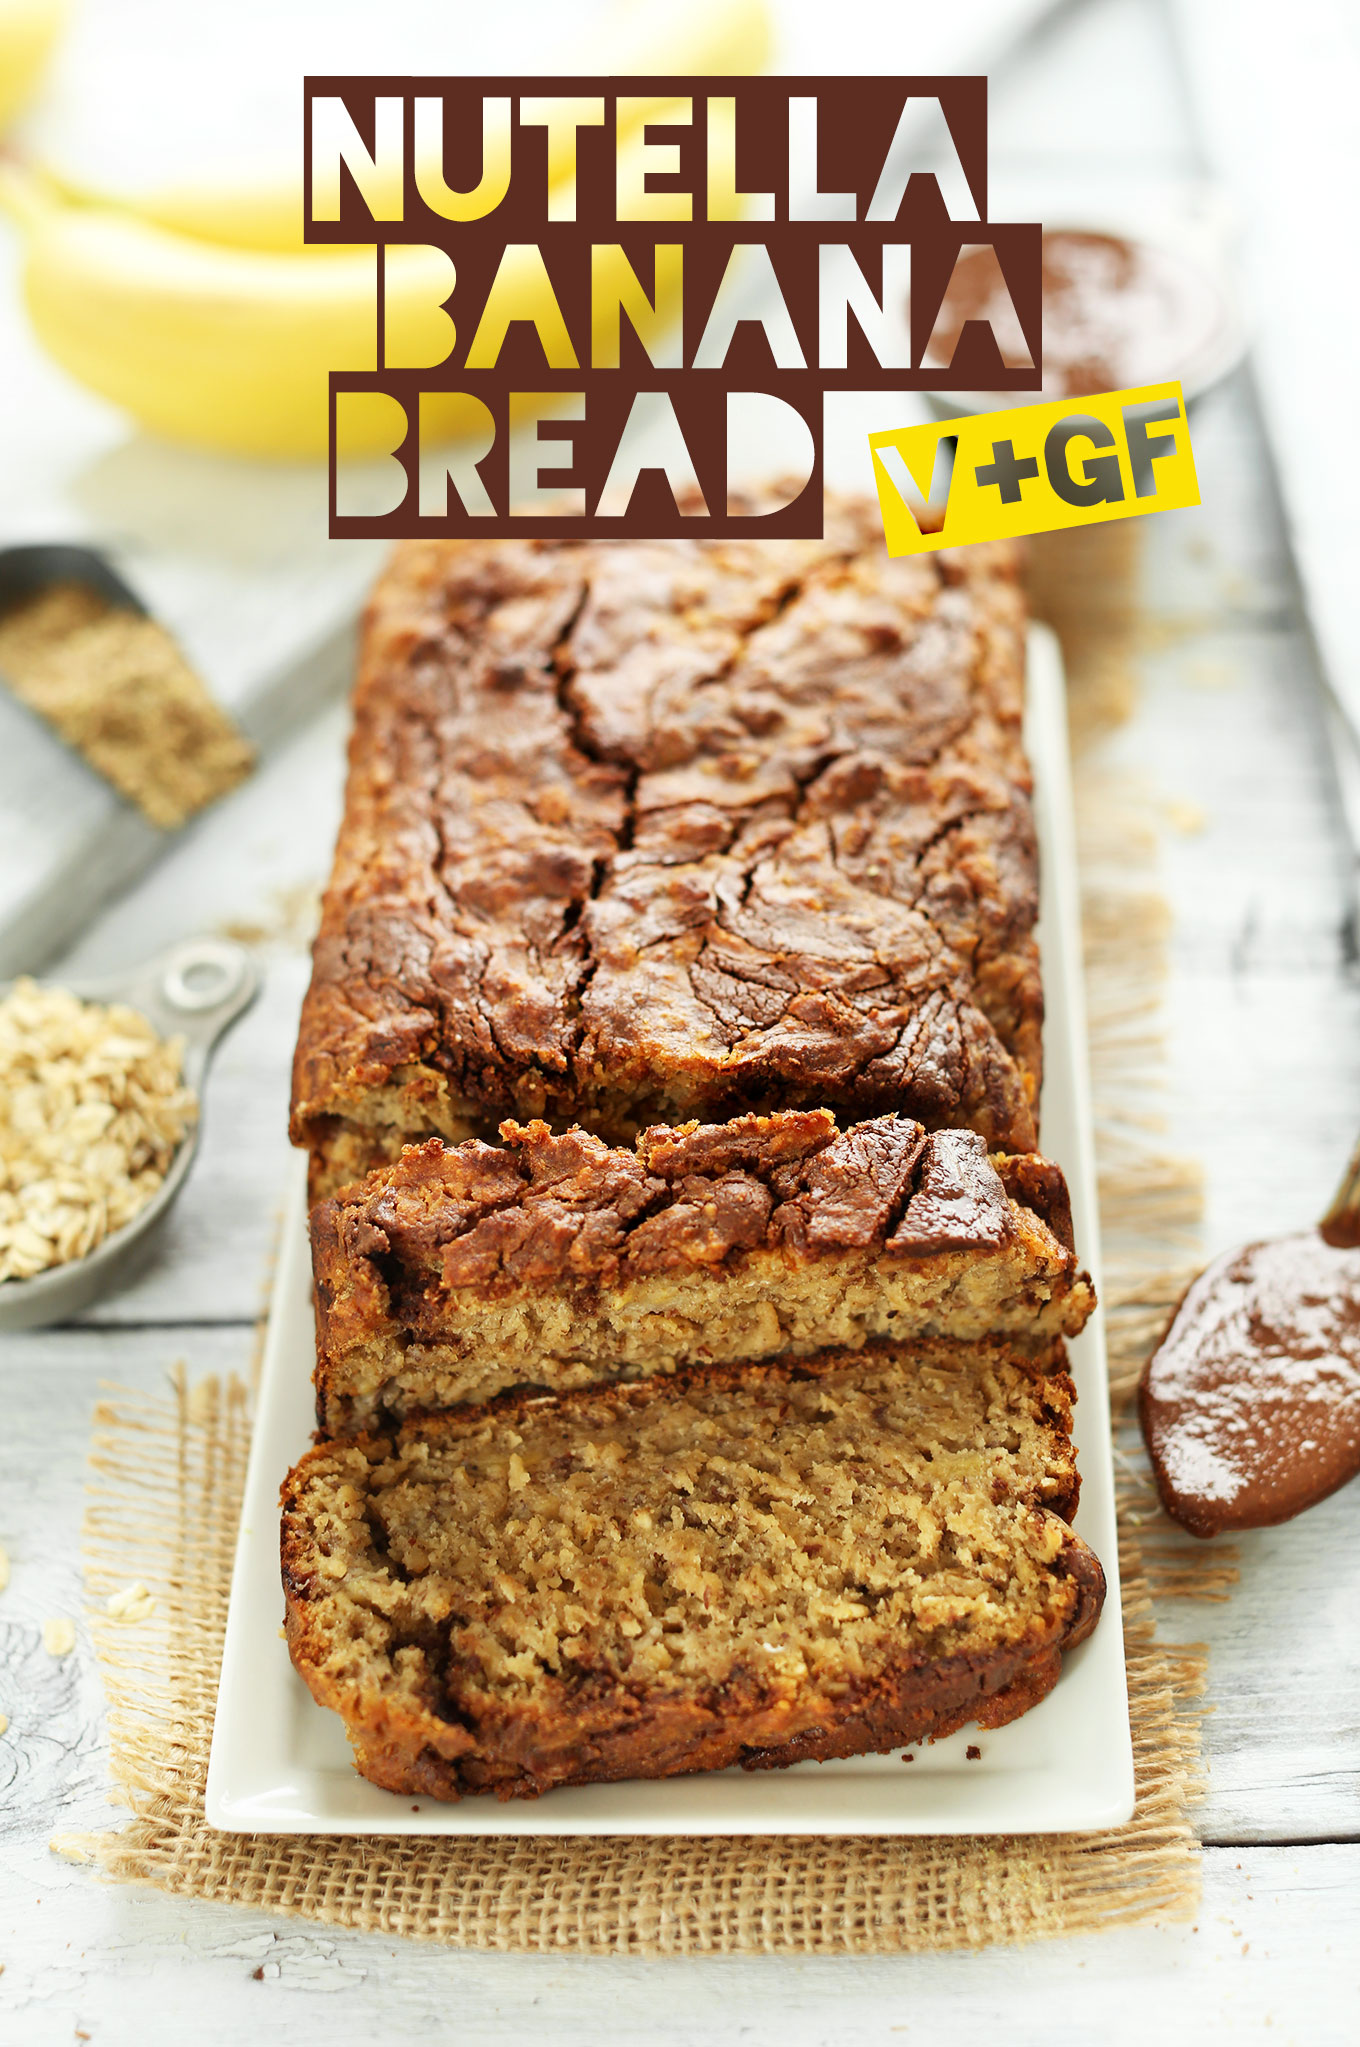 1-Bowl VEGAN Nutella Banana Bread! #vegan #glutenfree #minimalistbaker